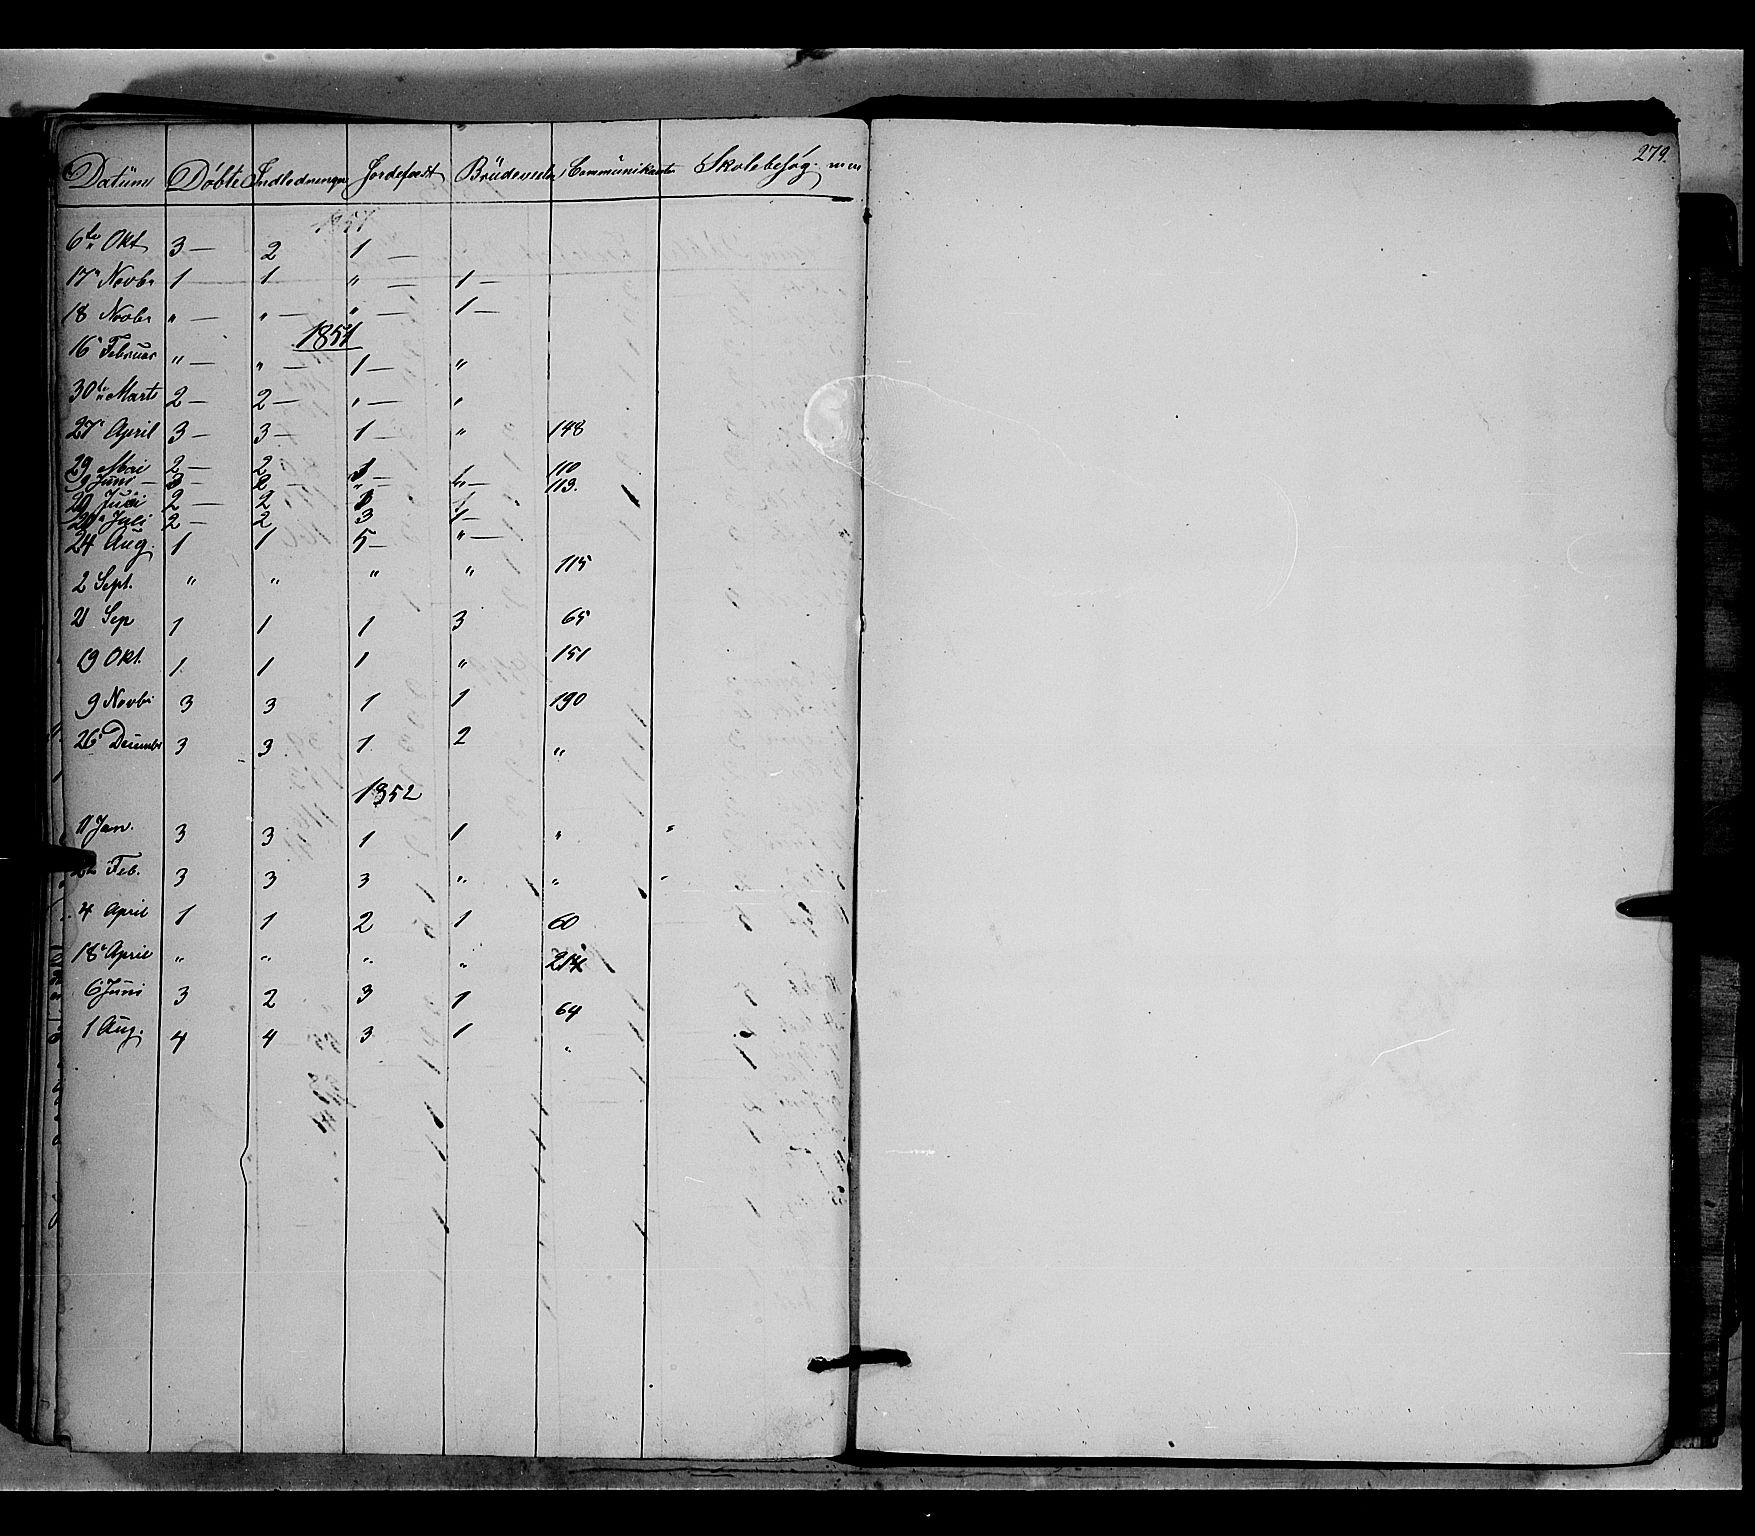 SAH, Nord-Aurdal prestekontor, Ministerialbok nr. 5, 1842-1863, s. 279